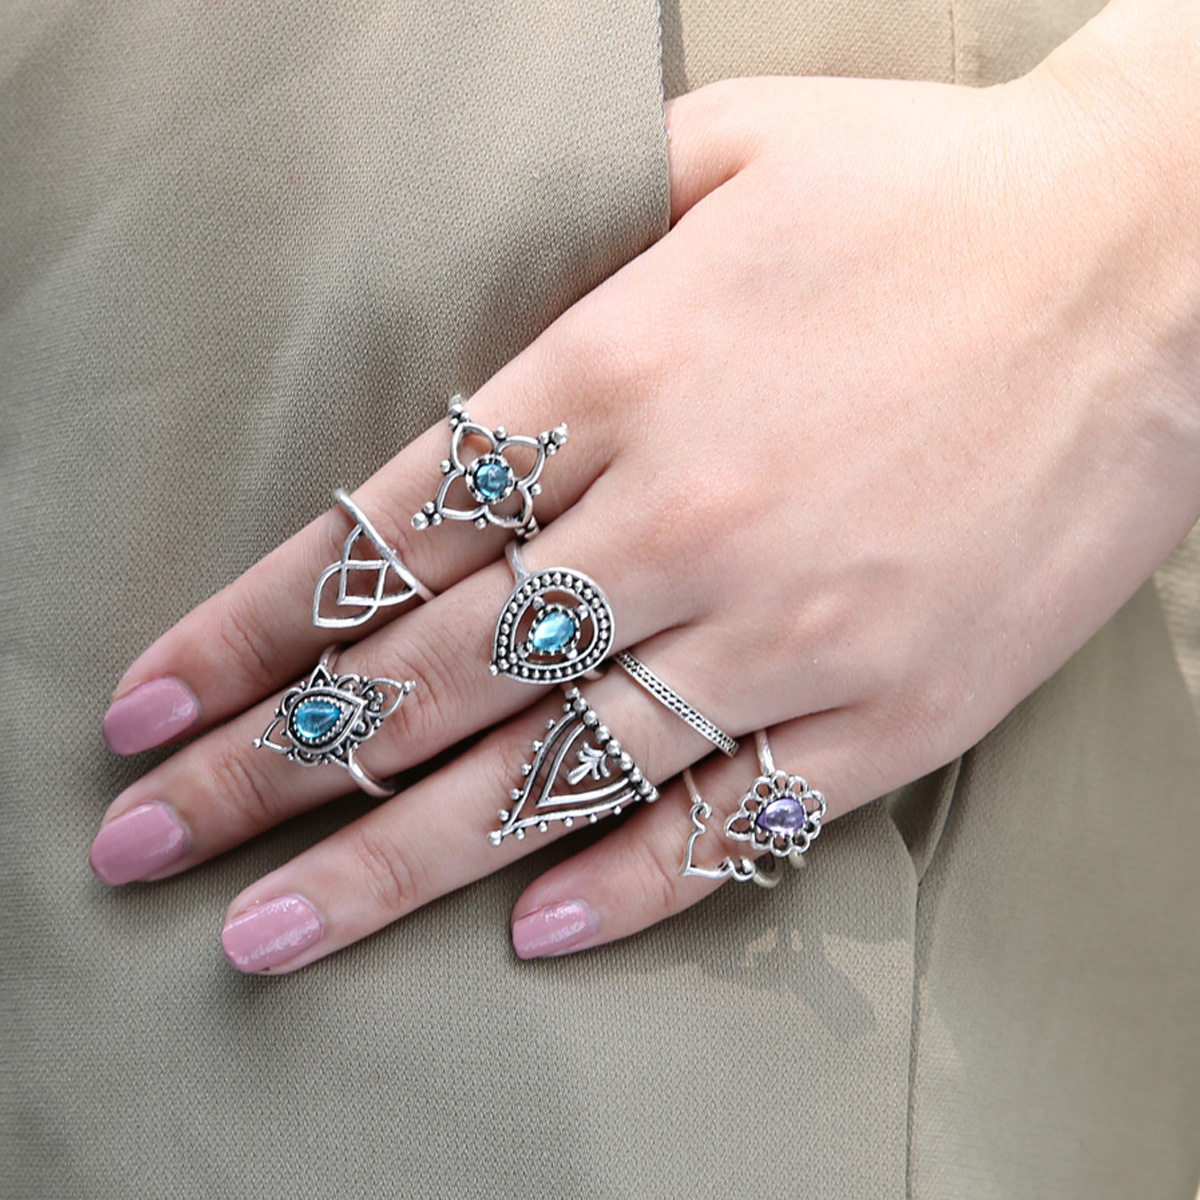 10pcs Boho Vintage Knuckle Stacking Ring Punk Silver Gold Color ...